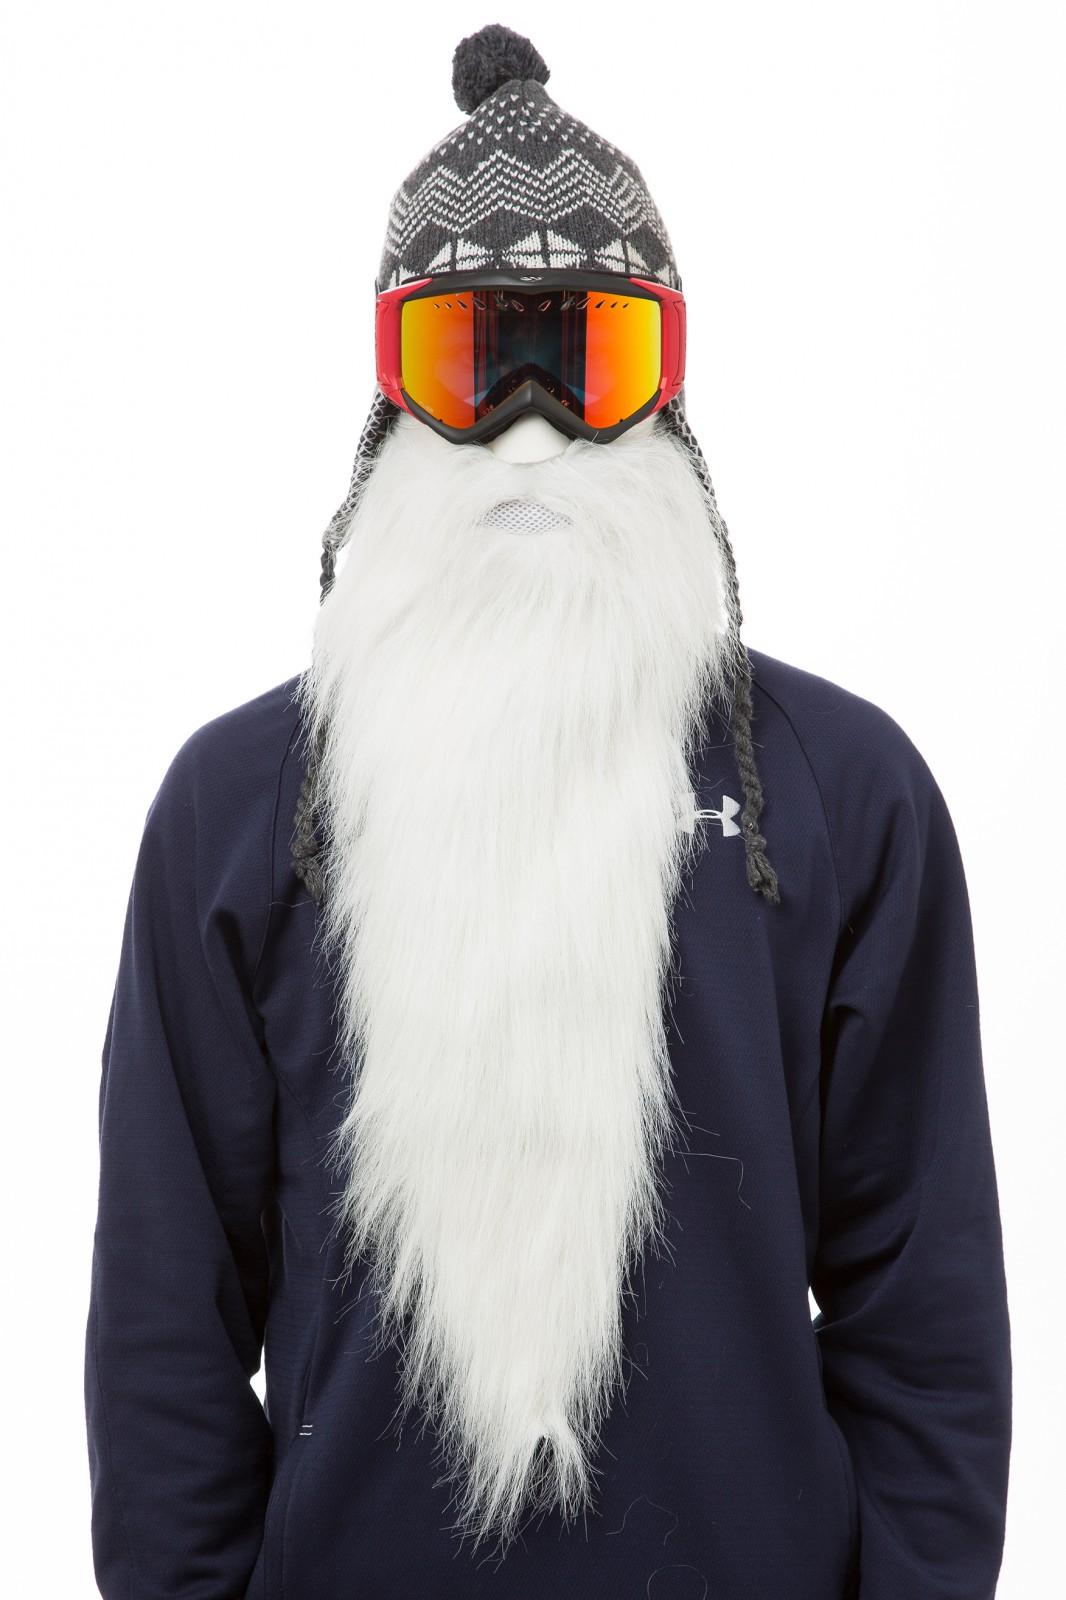 Beardski Merlin Langer Bart Skimaske Weiß